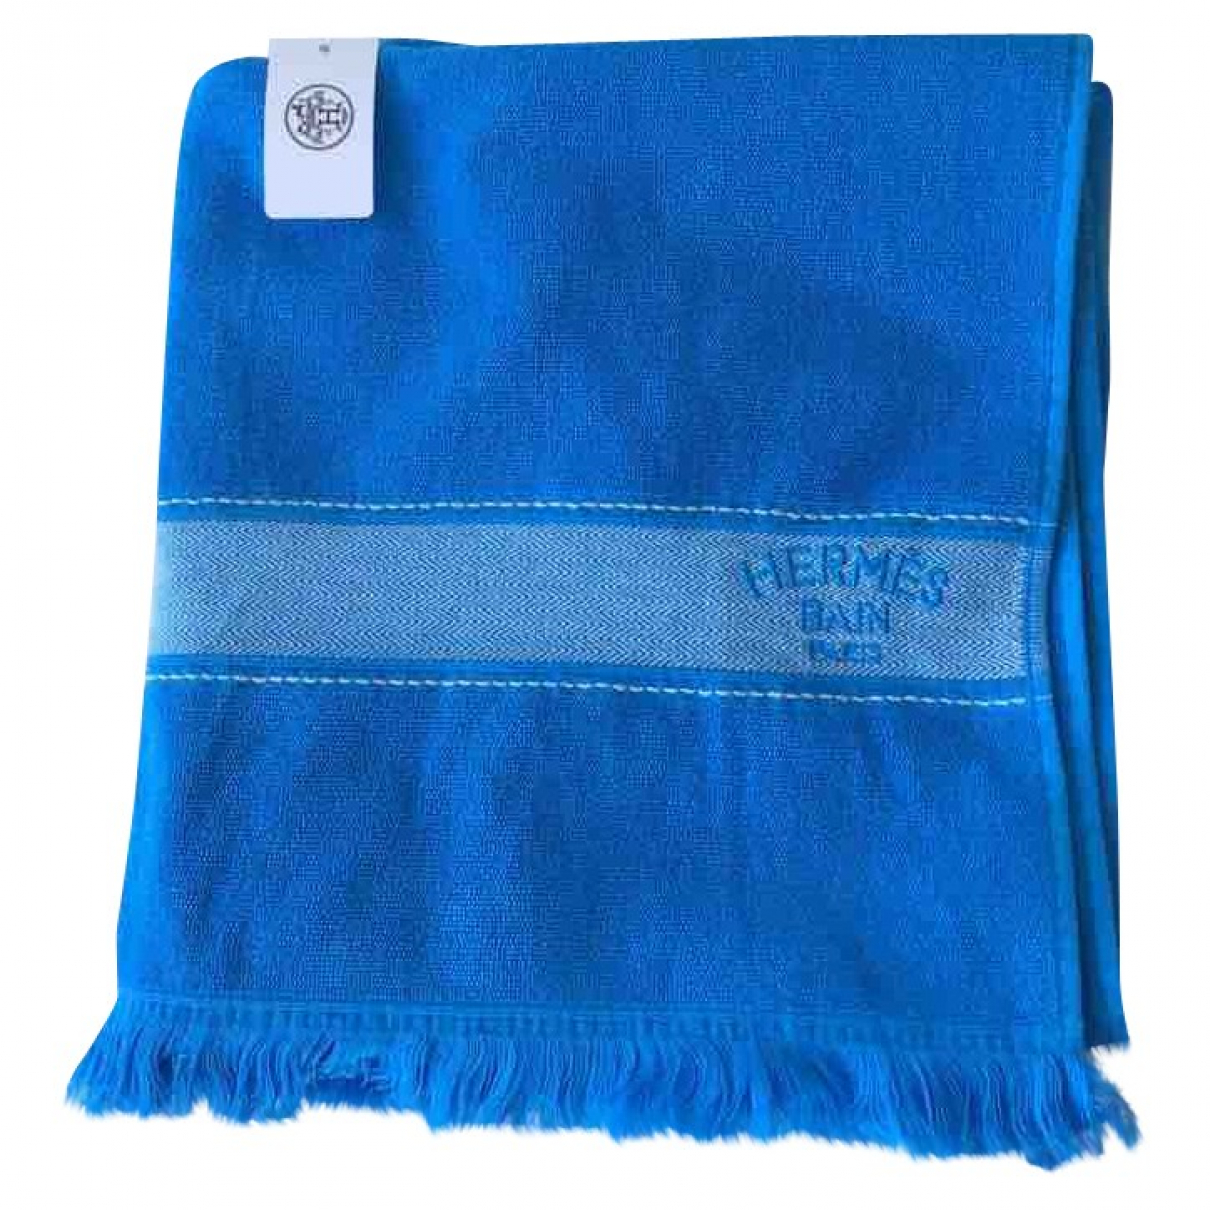 Hermès \N Blue Cotton Textiles for Life & Living \N